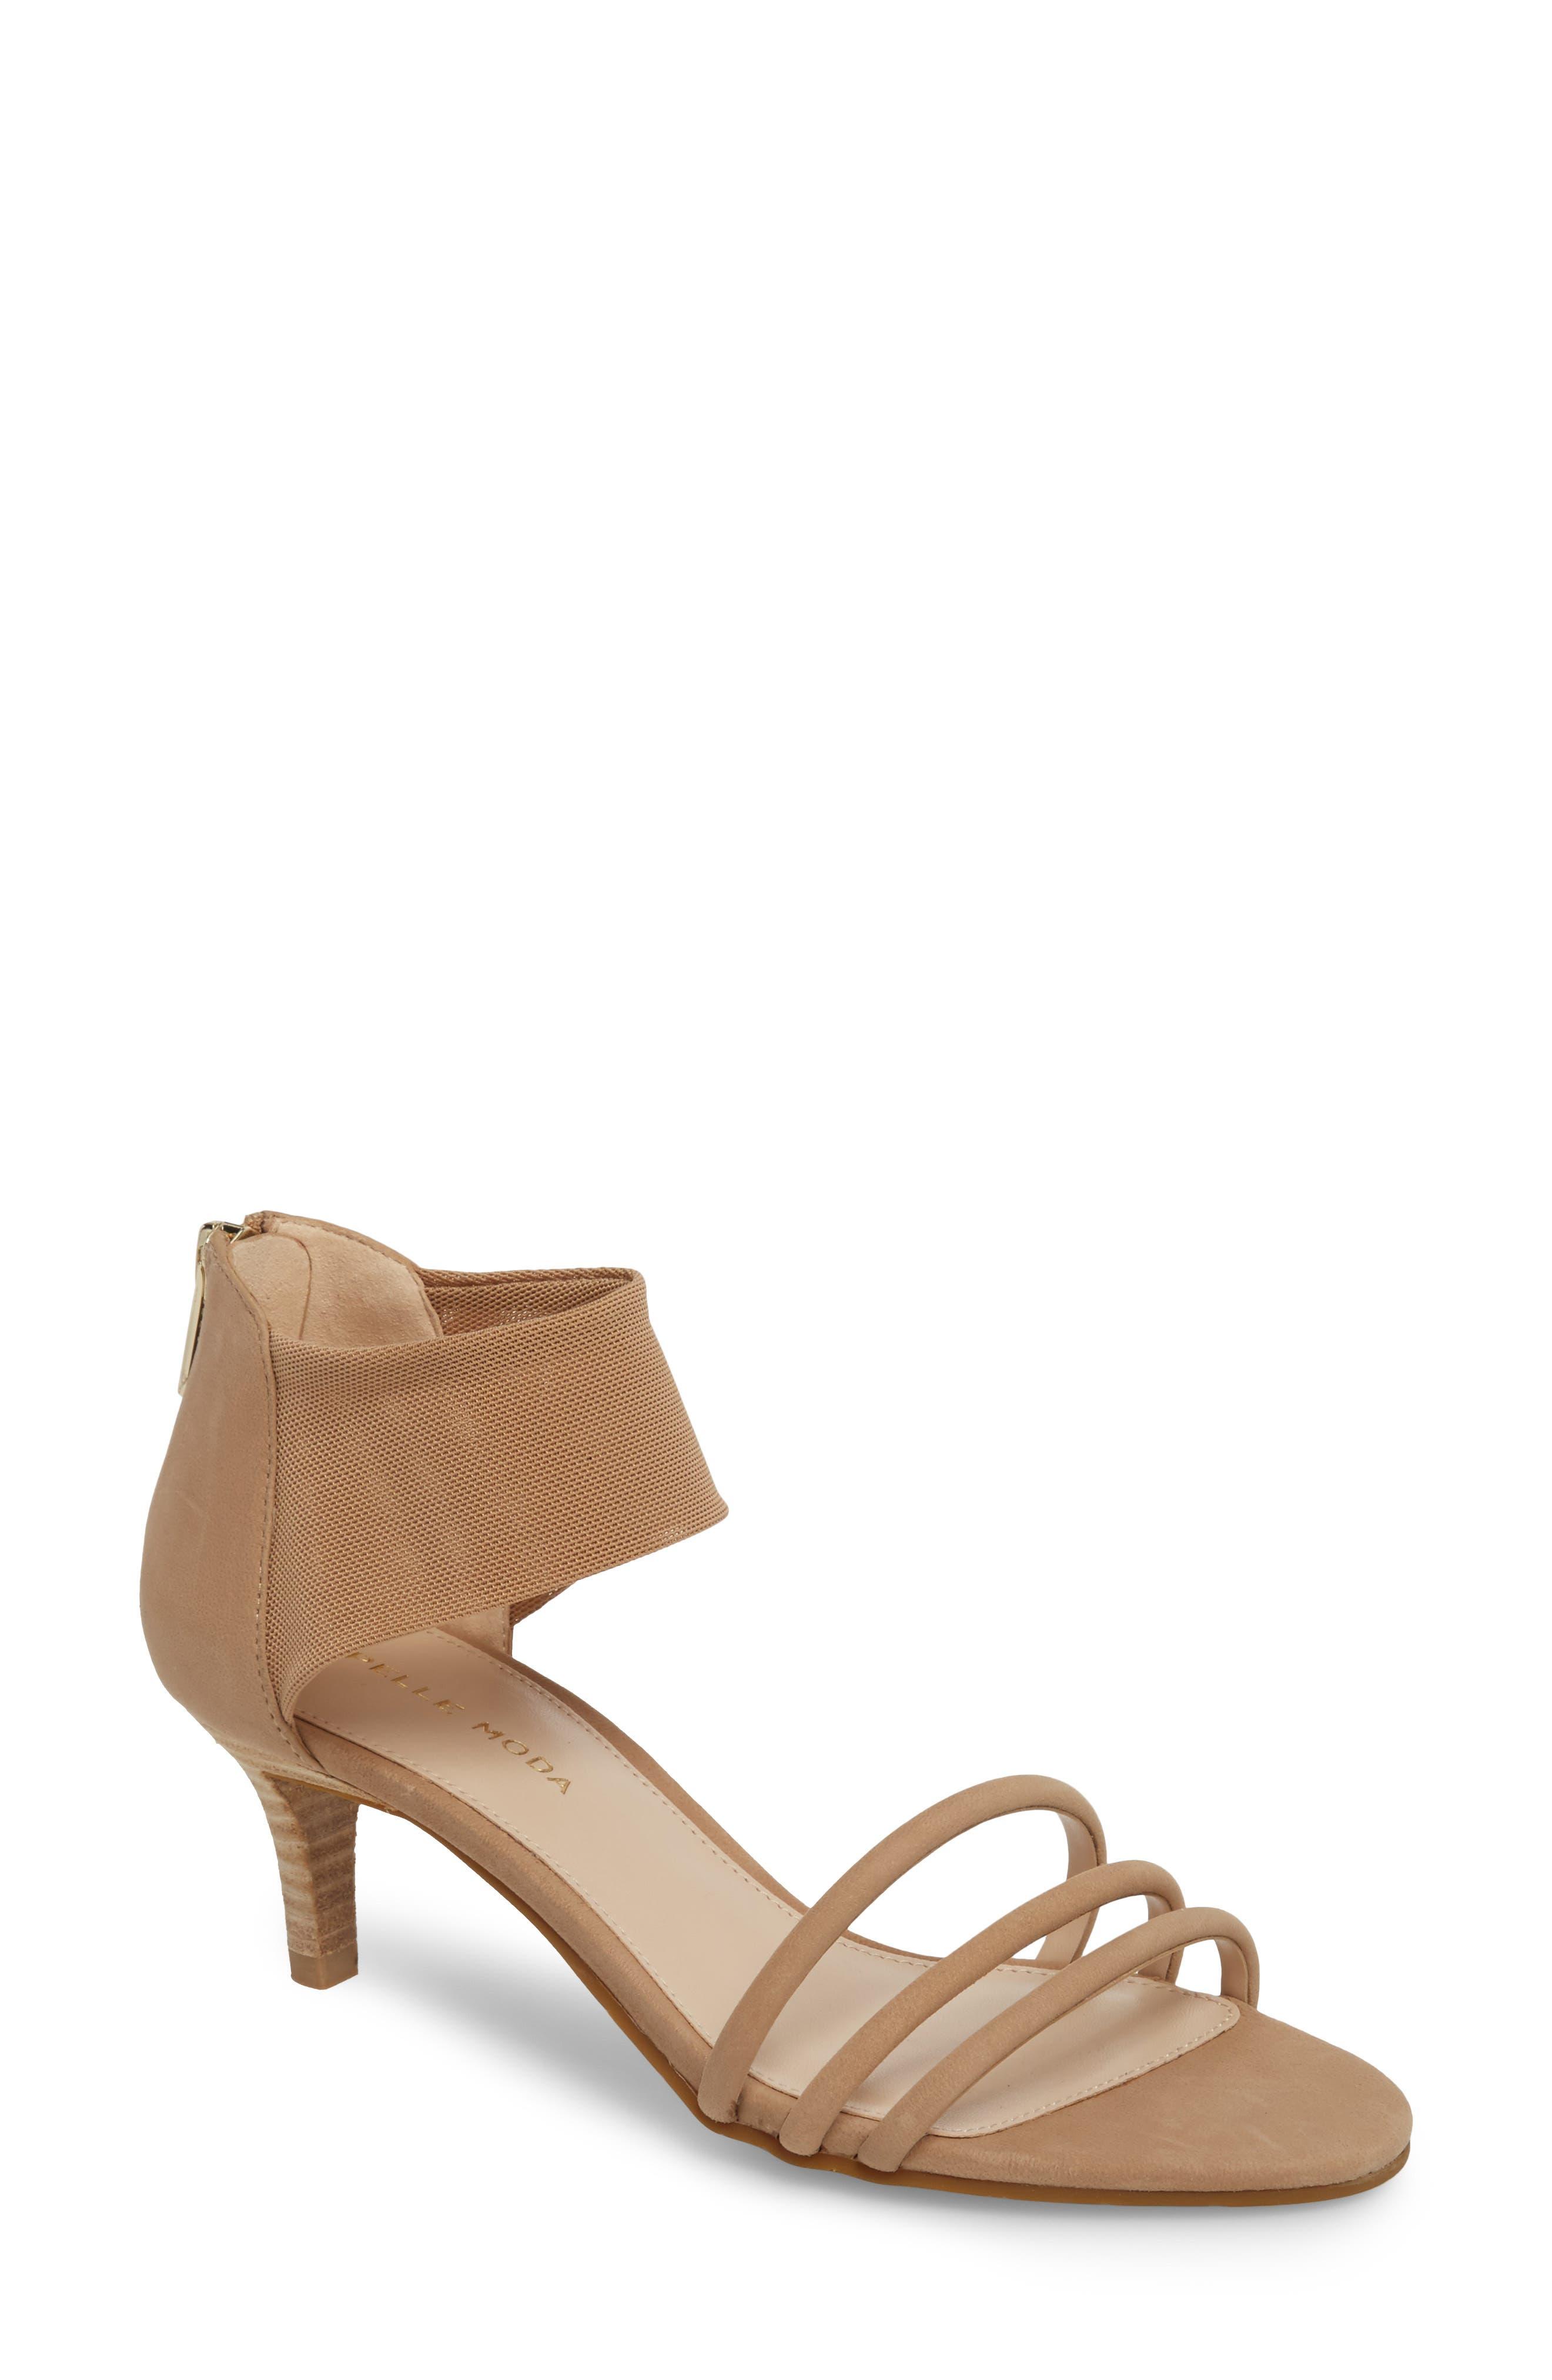 Berri Ankle Cuff Sandal,                             Main thumbnail 2, color,